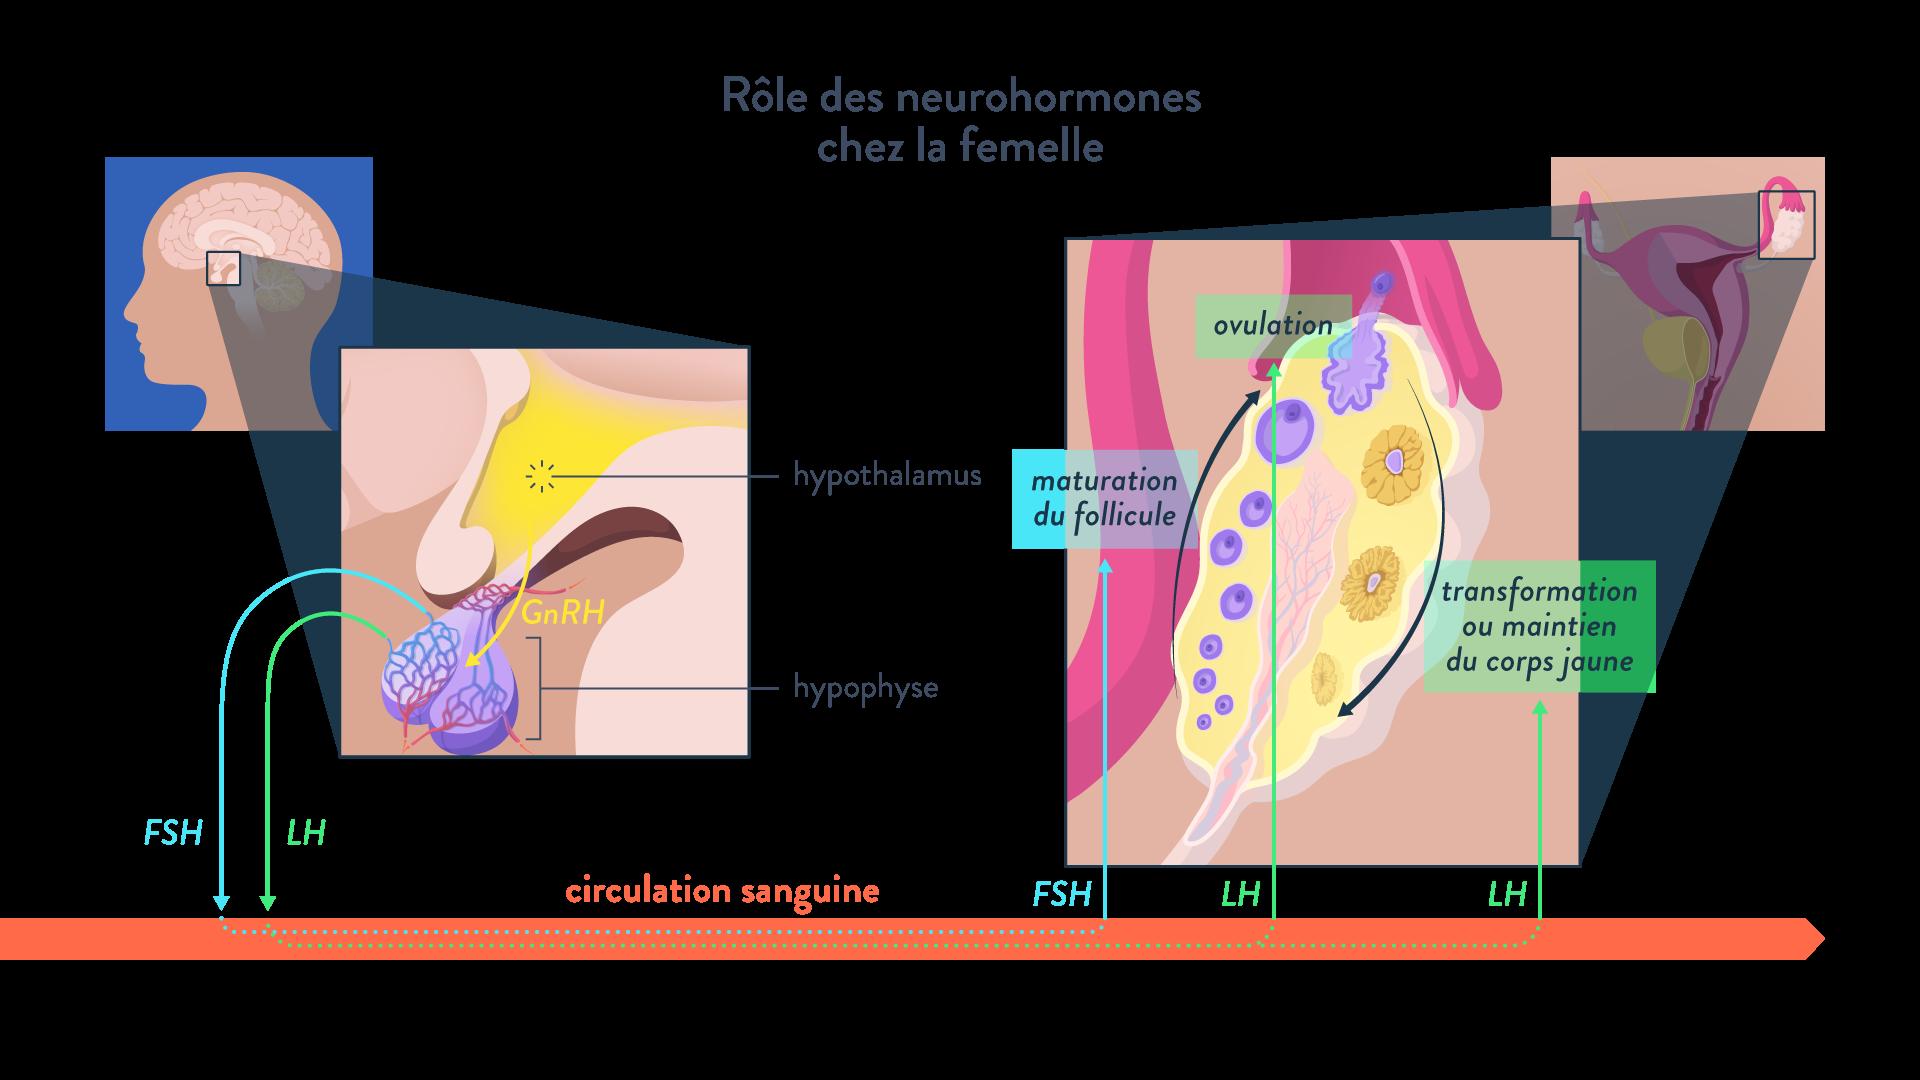 neurohormones FSH LH hypothalamus hypophyse